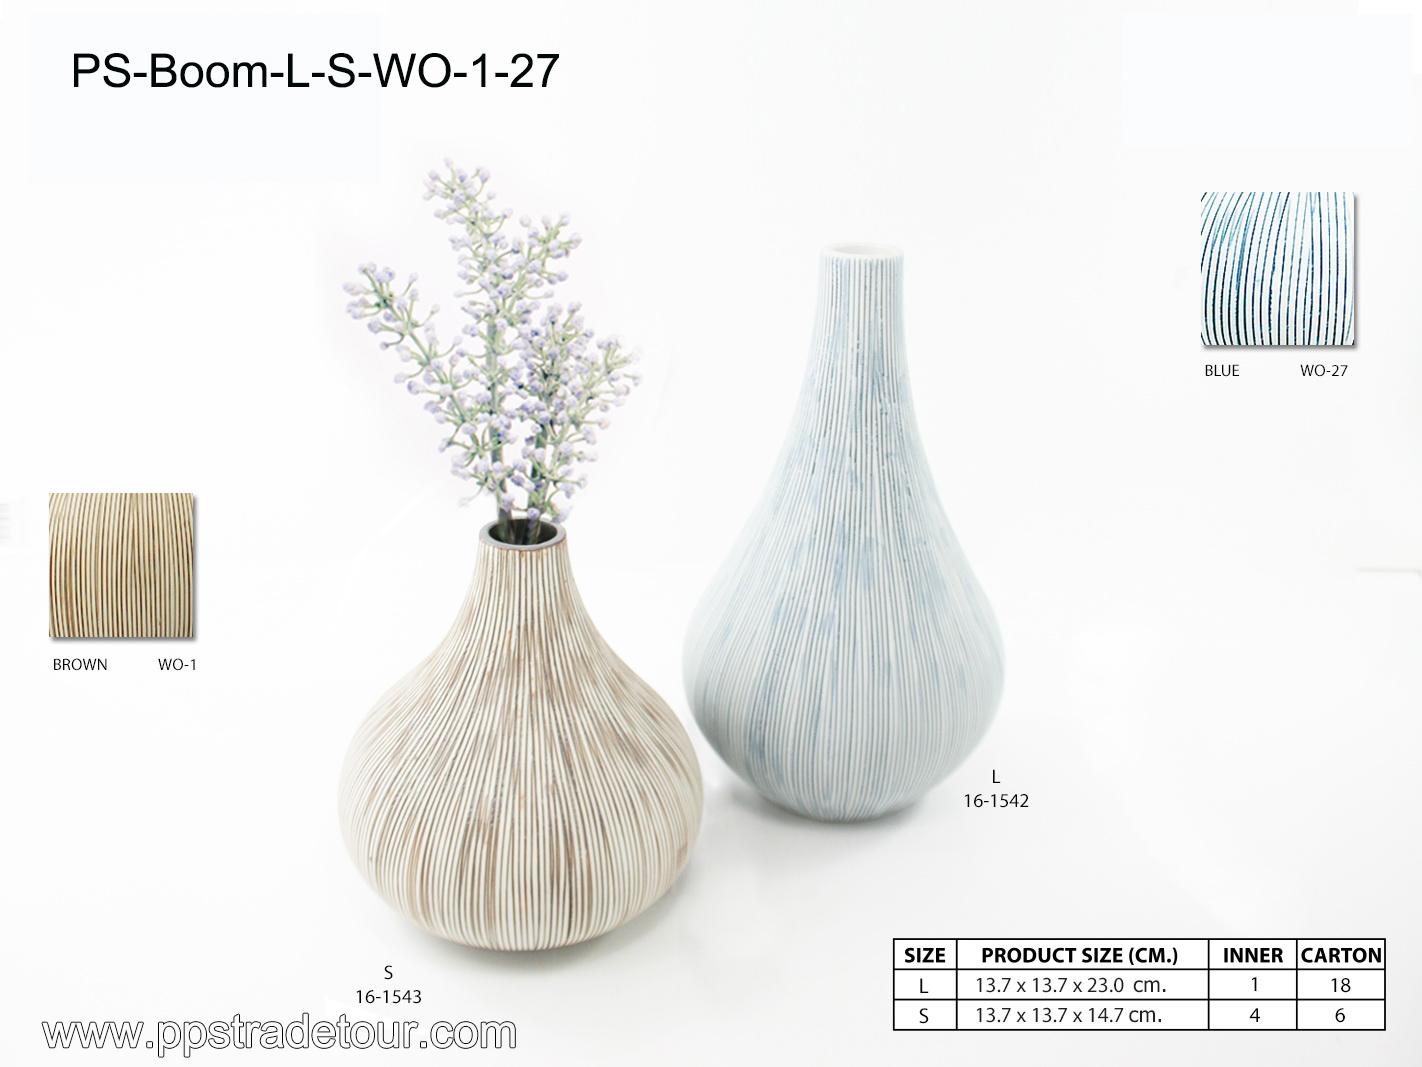 PSCV-BOOM-L-S-WO-1-27